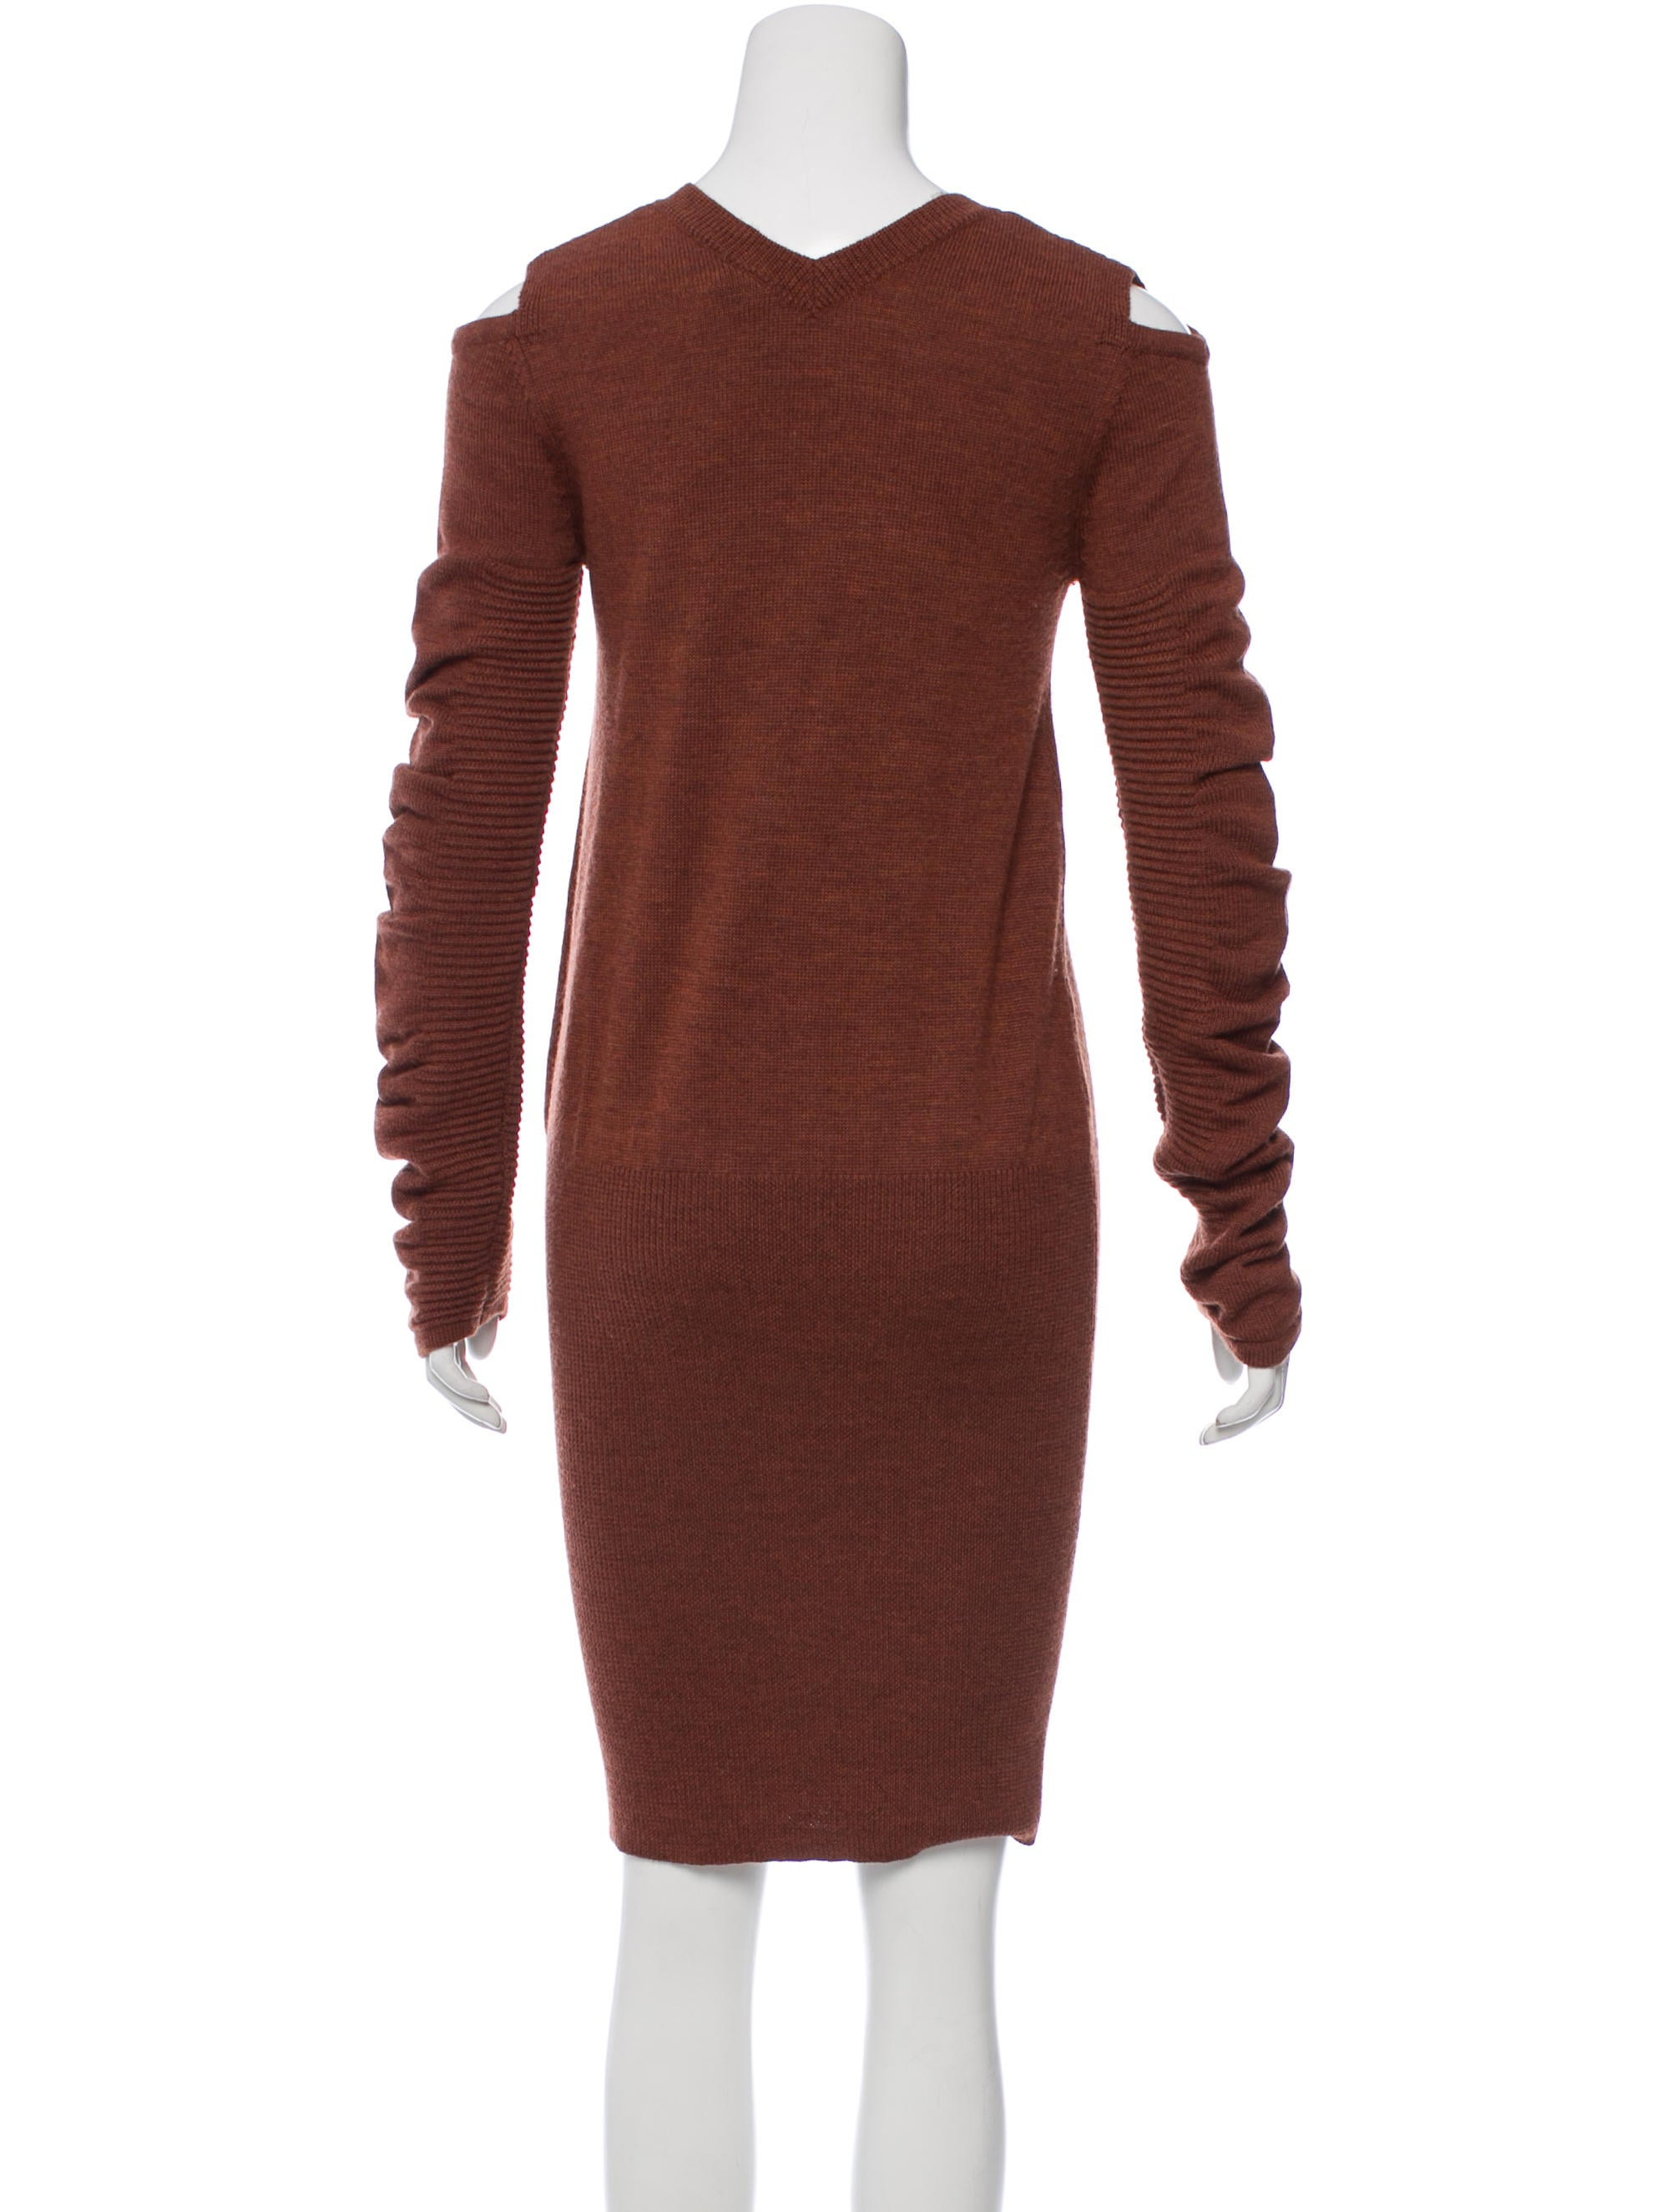 Zero + Maria Cornejo Wool Sweater Dress - Clothing - ZER23711 | The RealReal